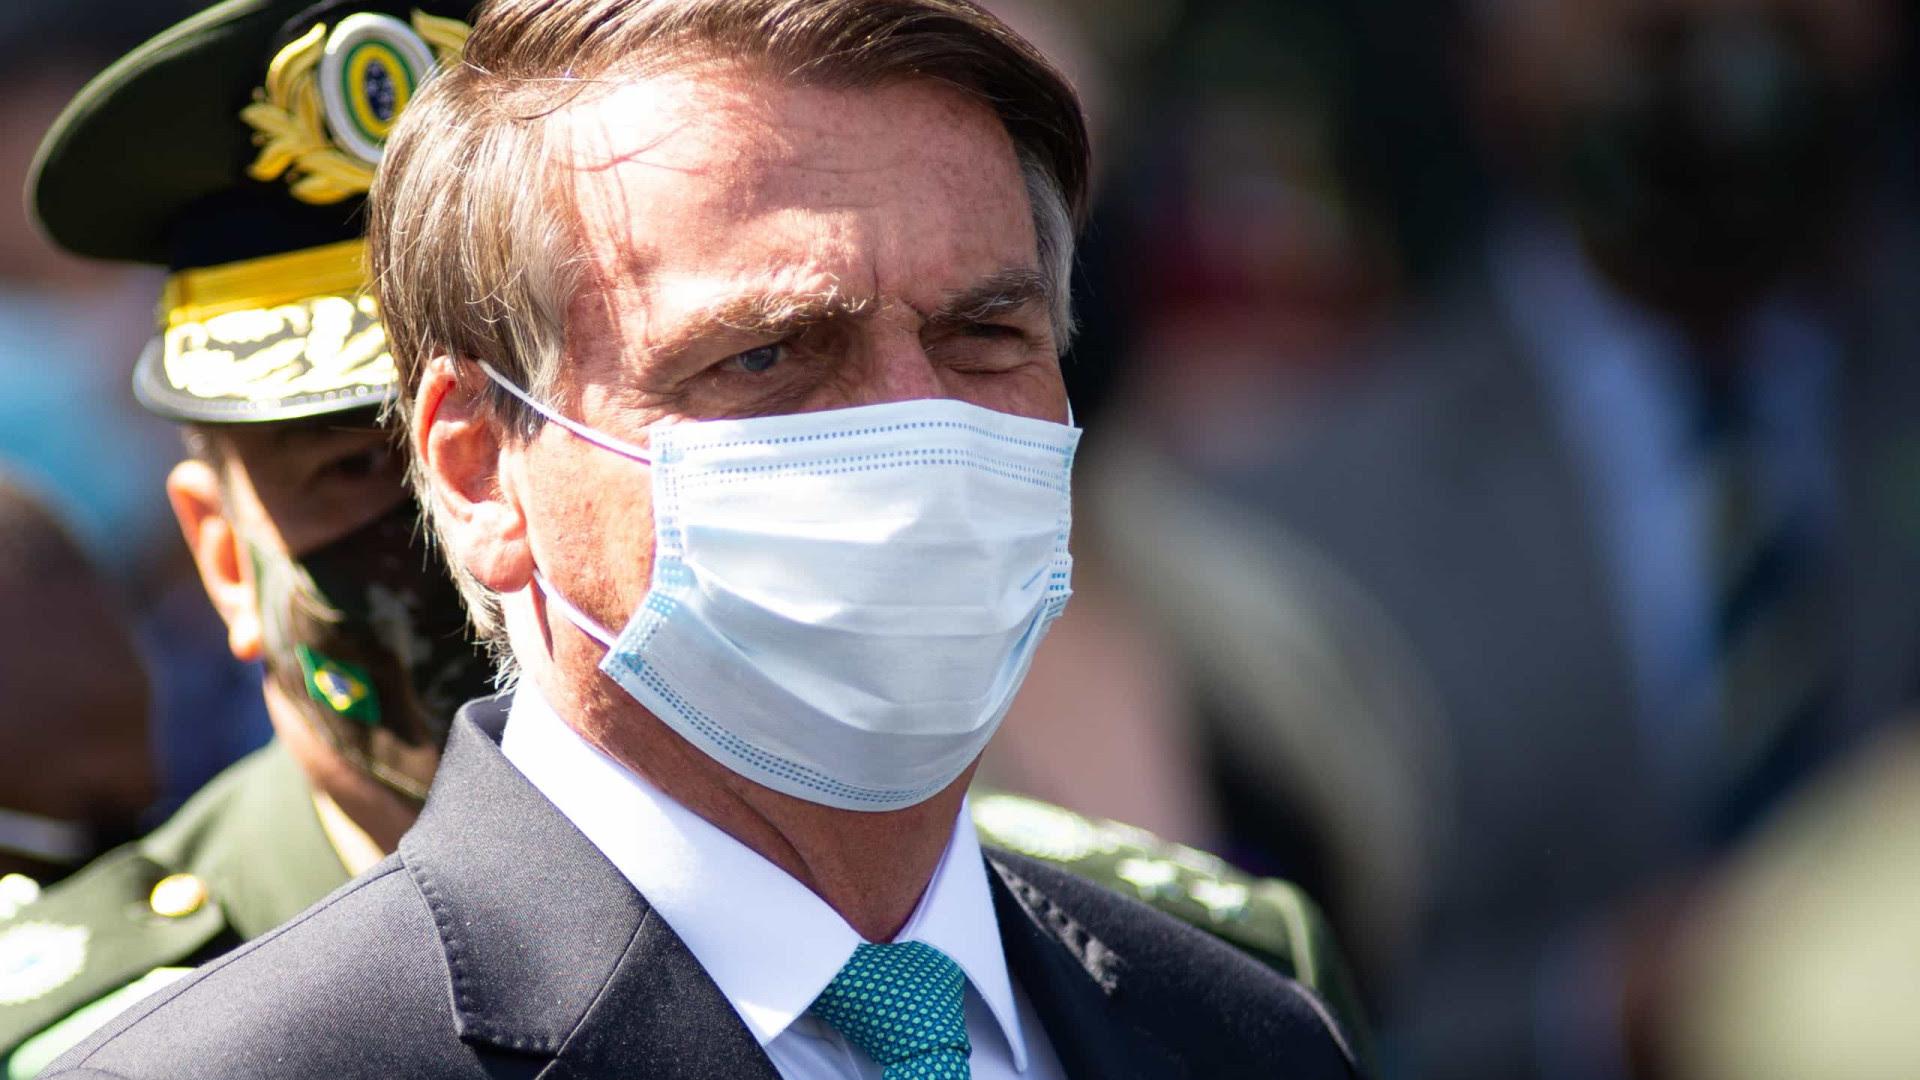 Bolsonaro ocultou do MPF compra de máscaras por metade do preço de modelo impróprio